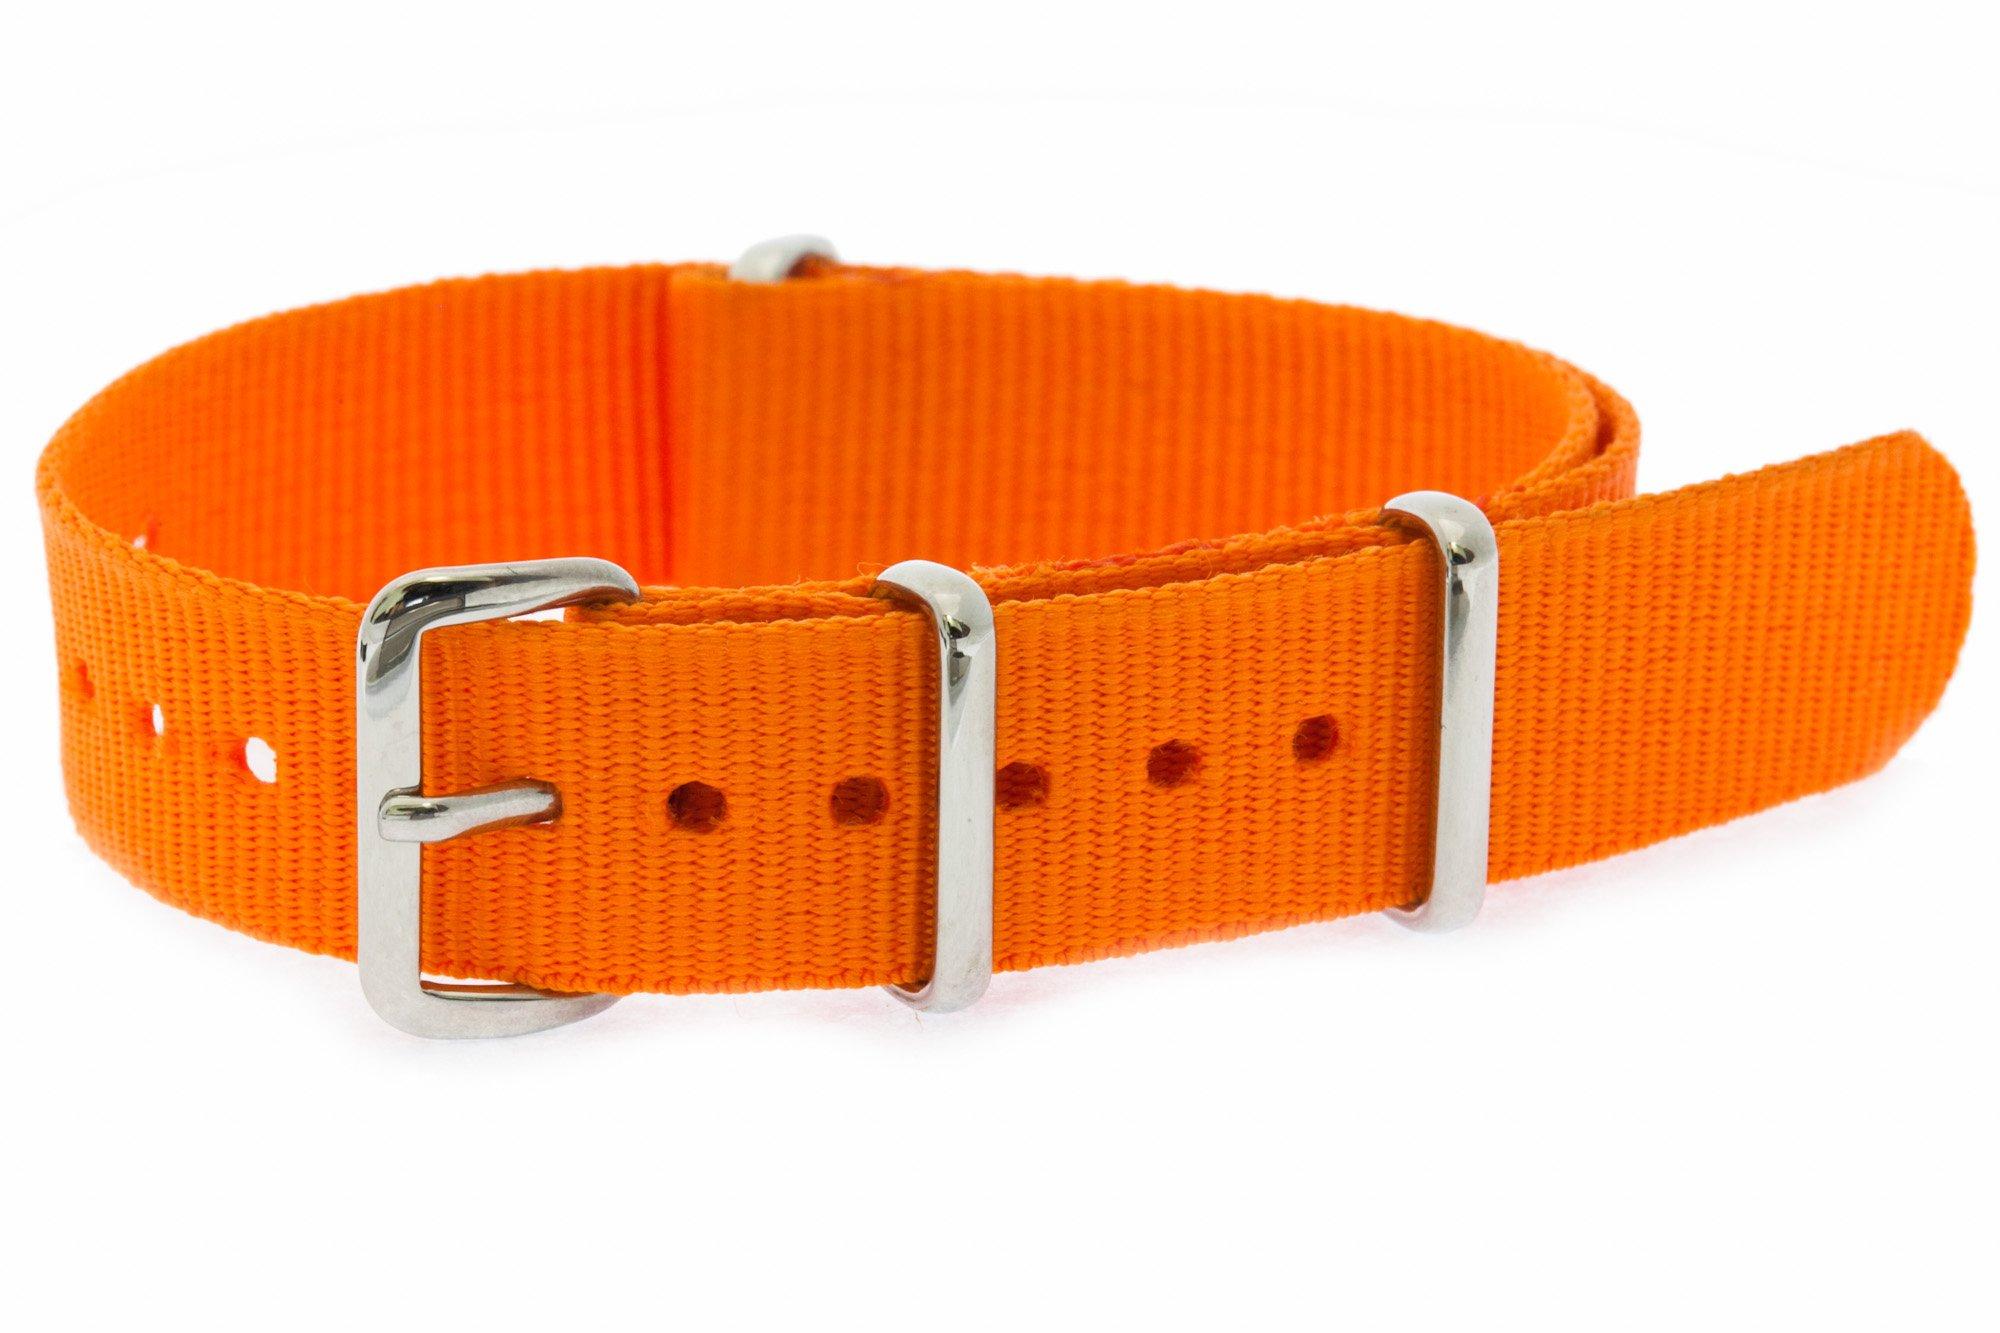 16mm [ Solid Orange ] Nylon Nato Band Military Watch Strap G10